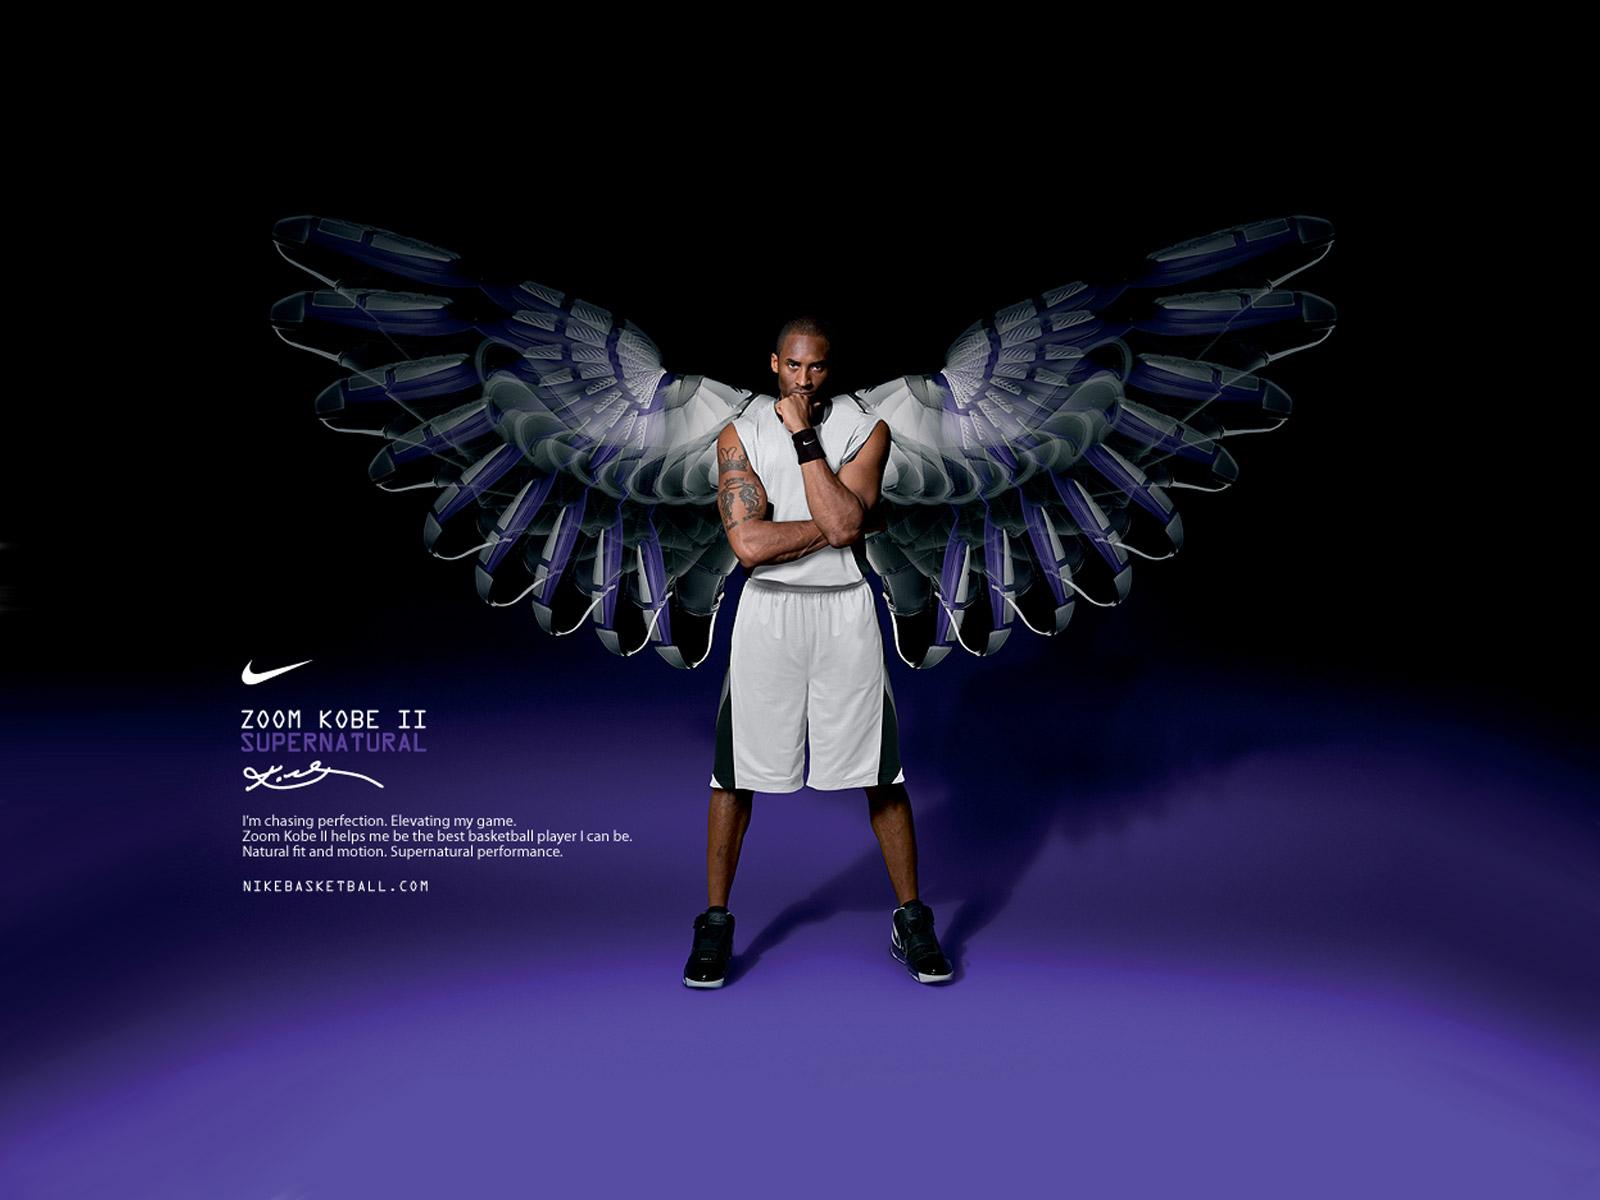 Kobe-Bryant-Nike-Zoom-Kobe-II-Wallpaper.jpg